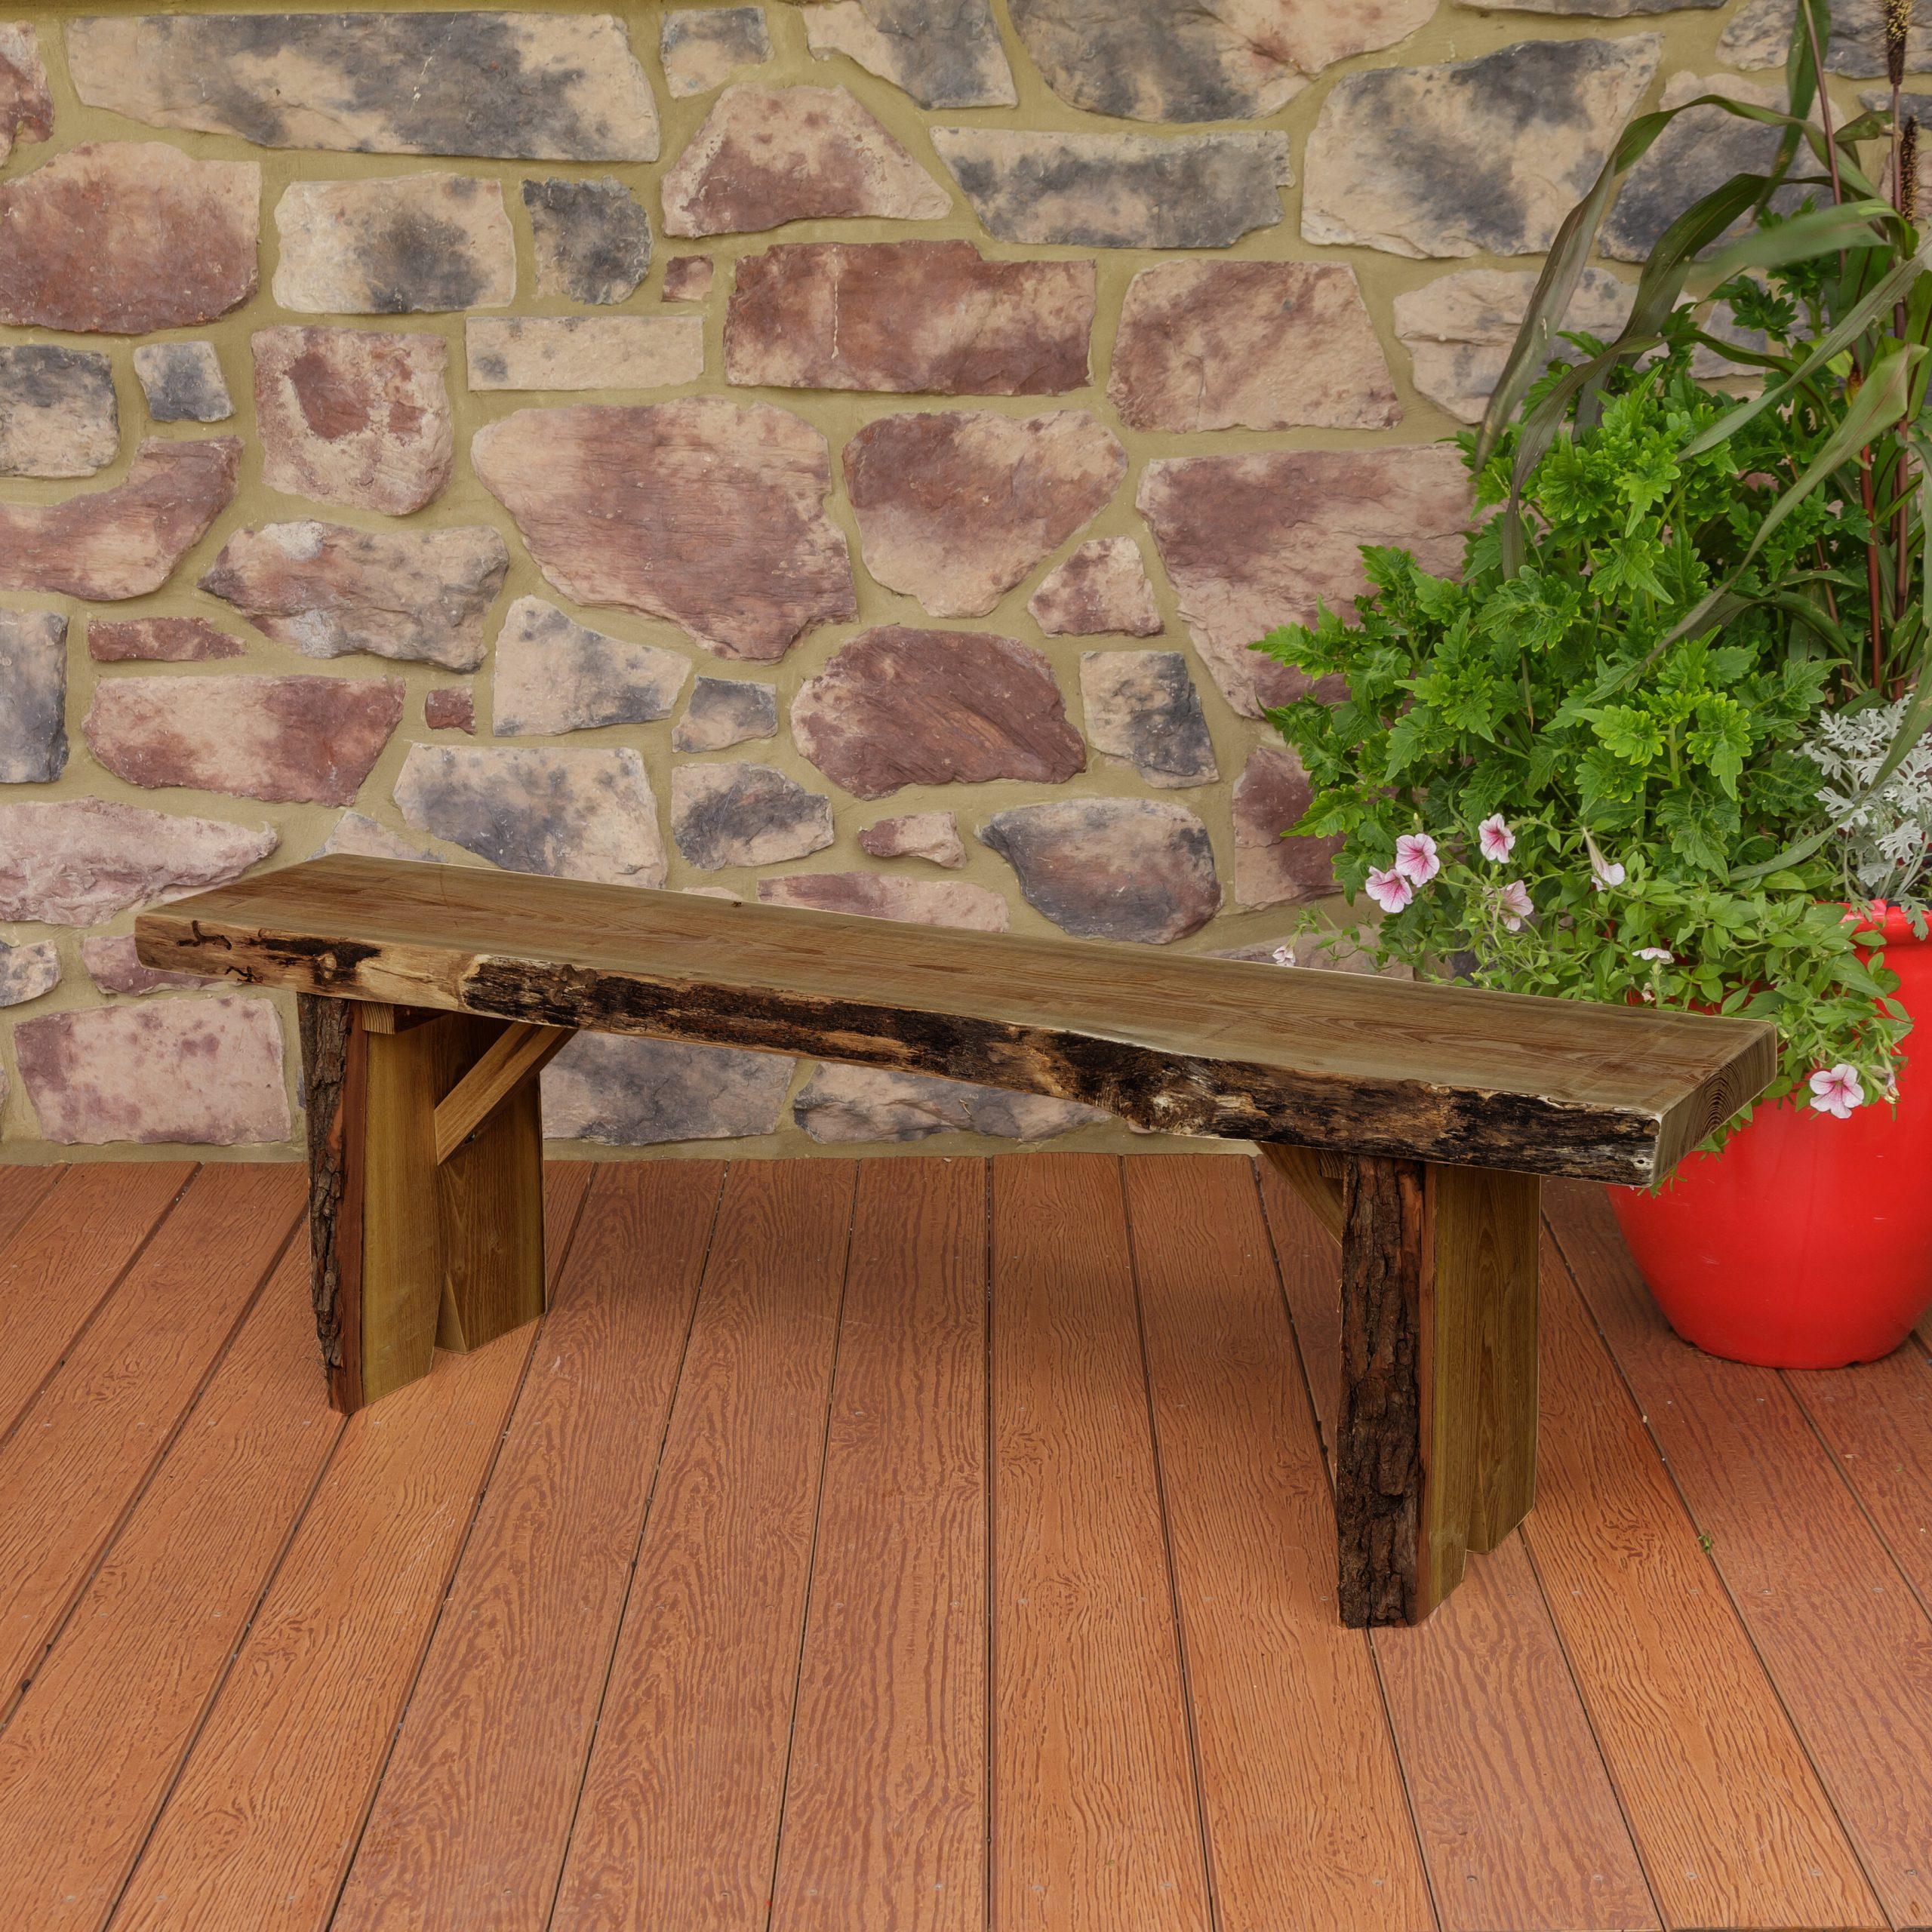 2019 Gabbert Wooden Garden Benches With Regard To Bruggeman Live Edge Solid Wood Garden Bench (View 16 of 30)